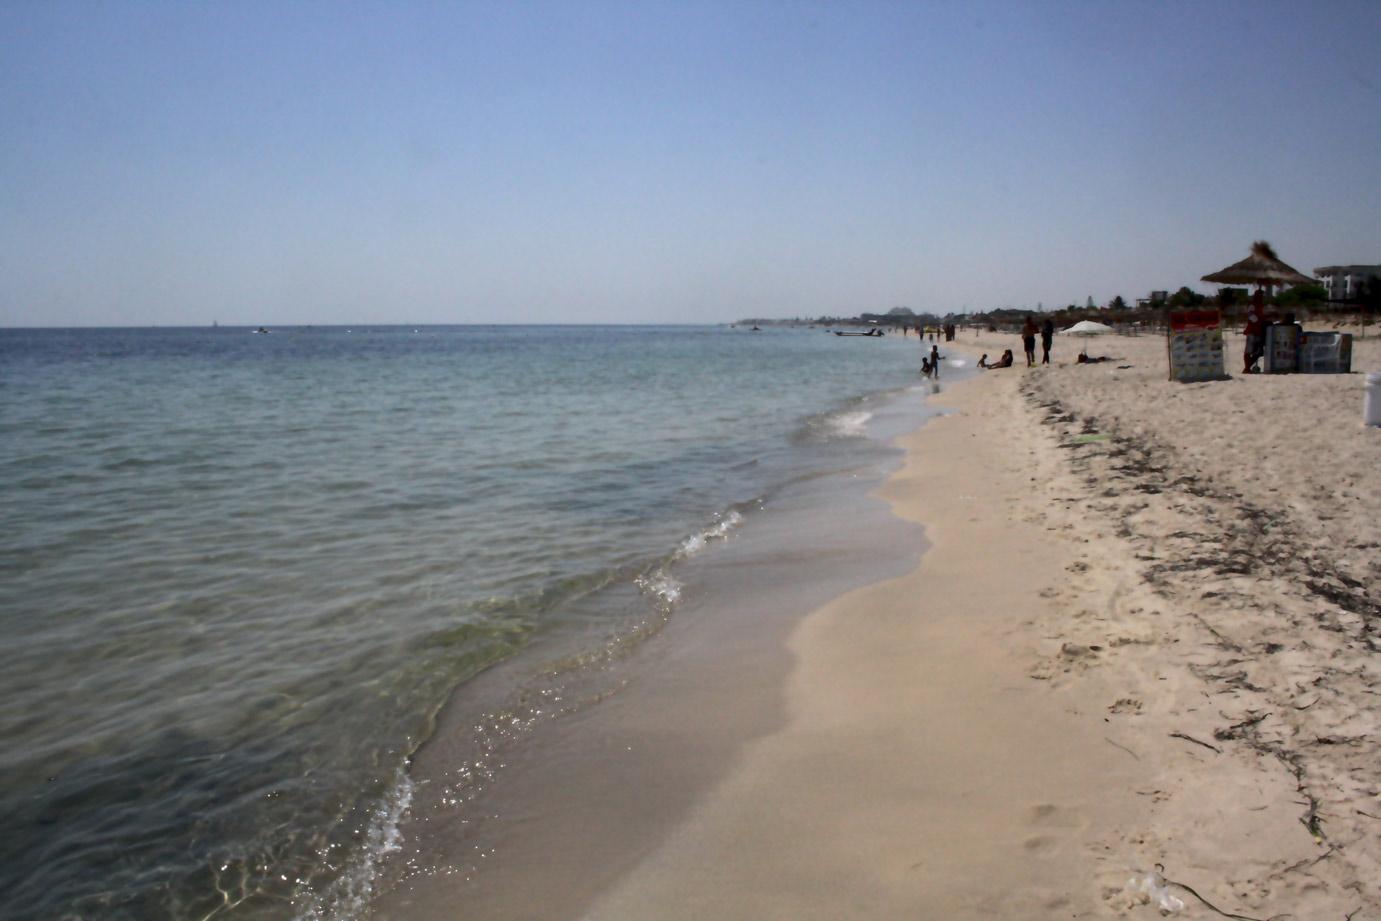 TUNISIA: PHOTO DIARY II. 7